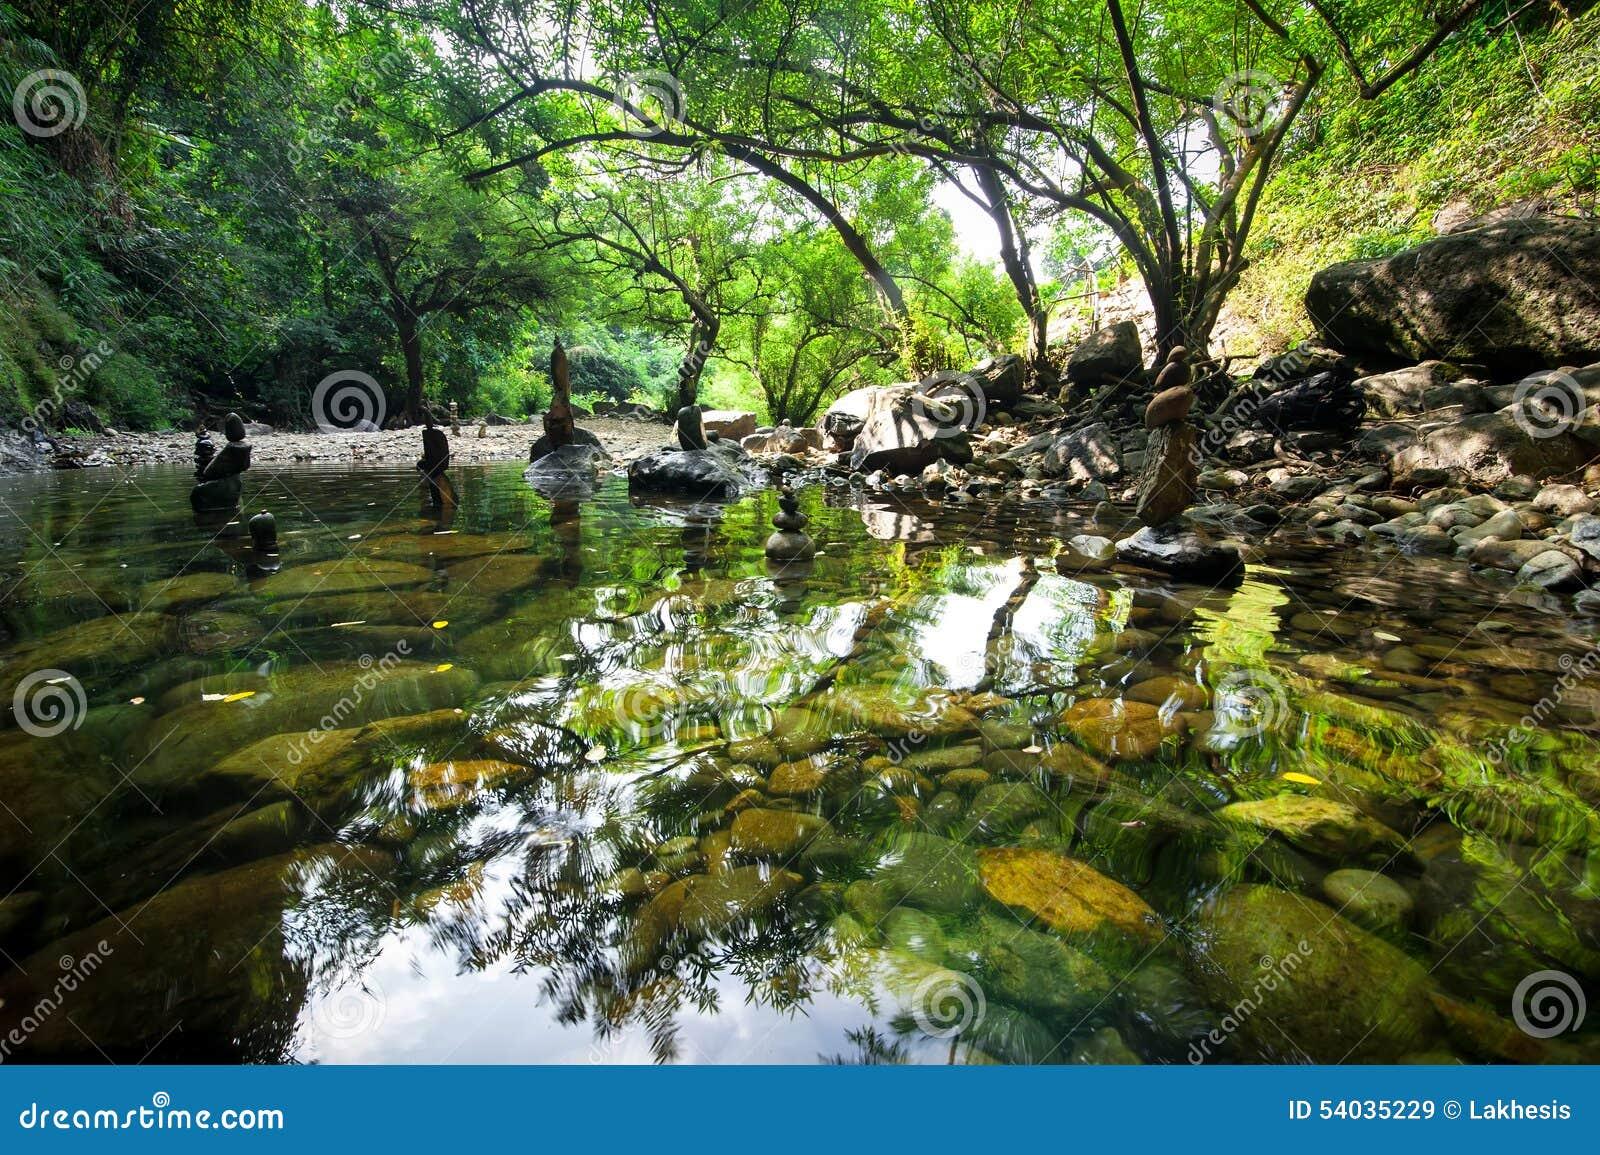 Balancing rocks tower for zen meditation in nature stock image image of nobody concept 54035229 - Image zen nature ...